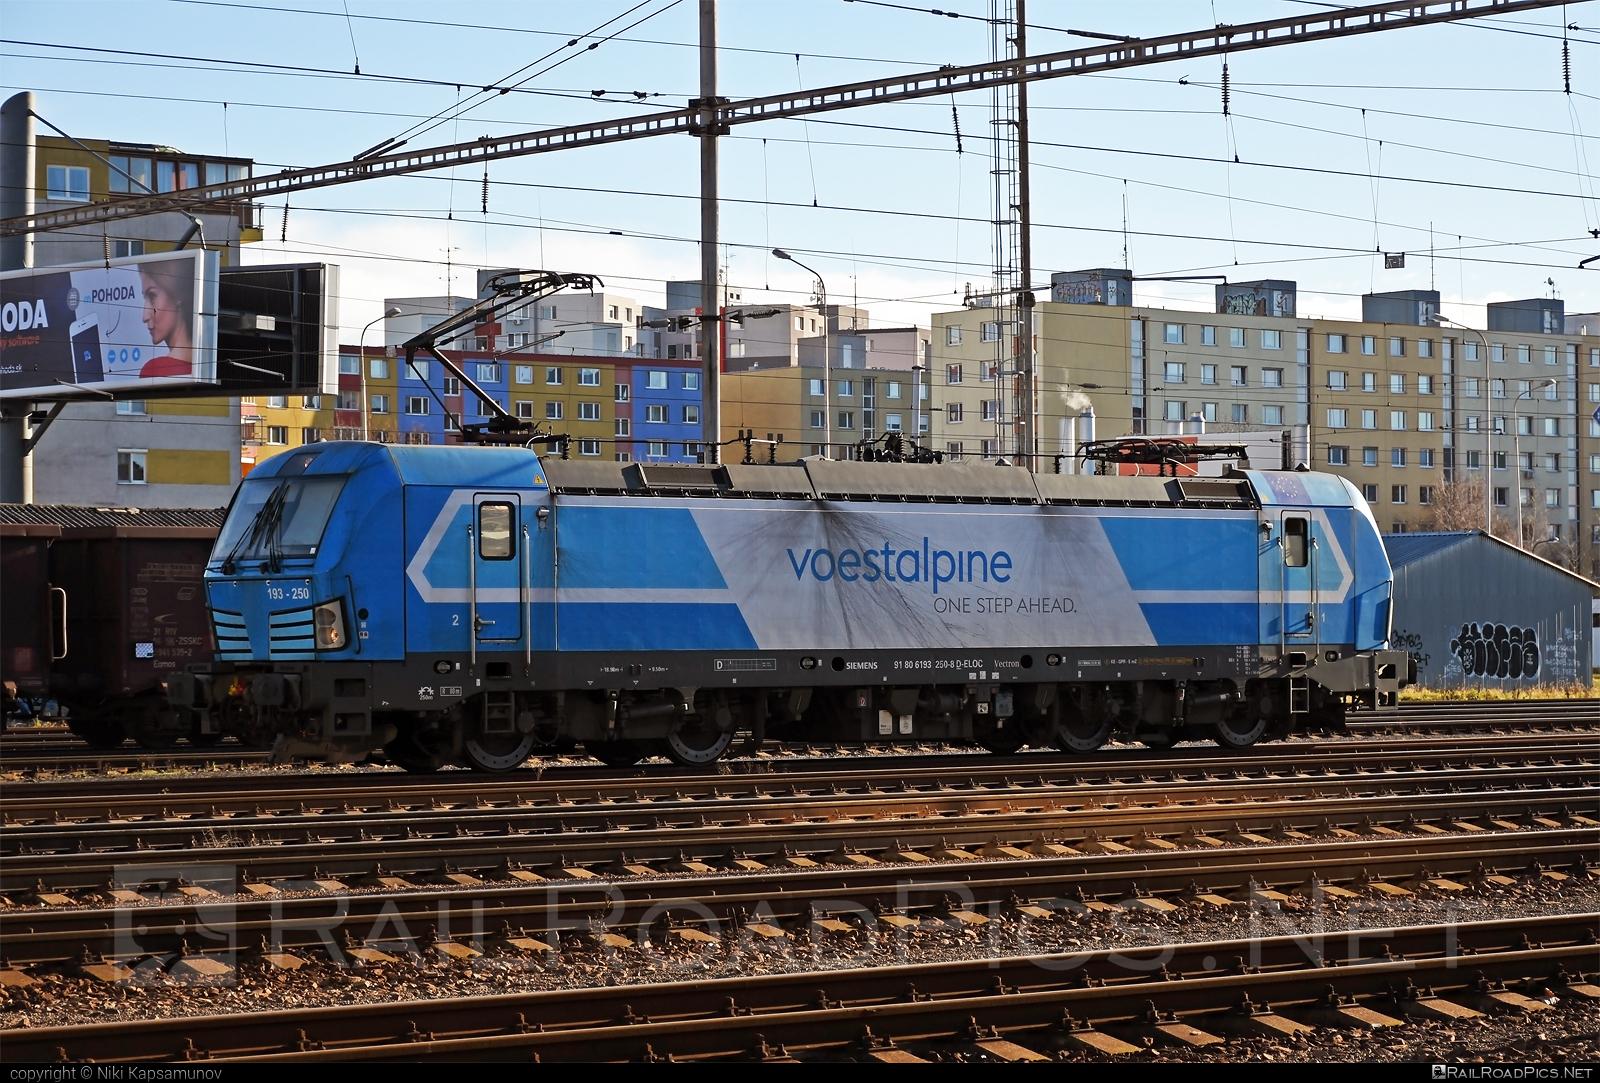 Siemens Vectron AC - 193 250 operated by Voestalpine BWG #ell #ellgermany #eloc #europeanlocomotiveleasing #siemens #siemensvectron #siemensvectronac #vectron #vectronac #voestalpine